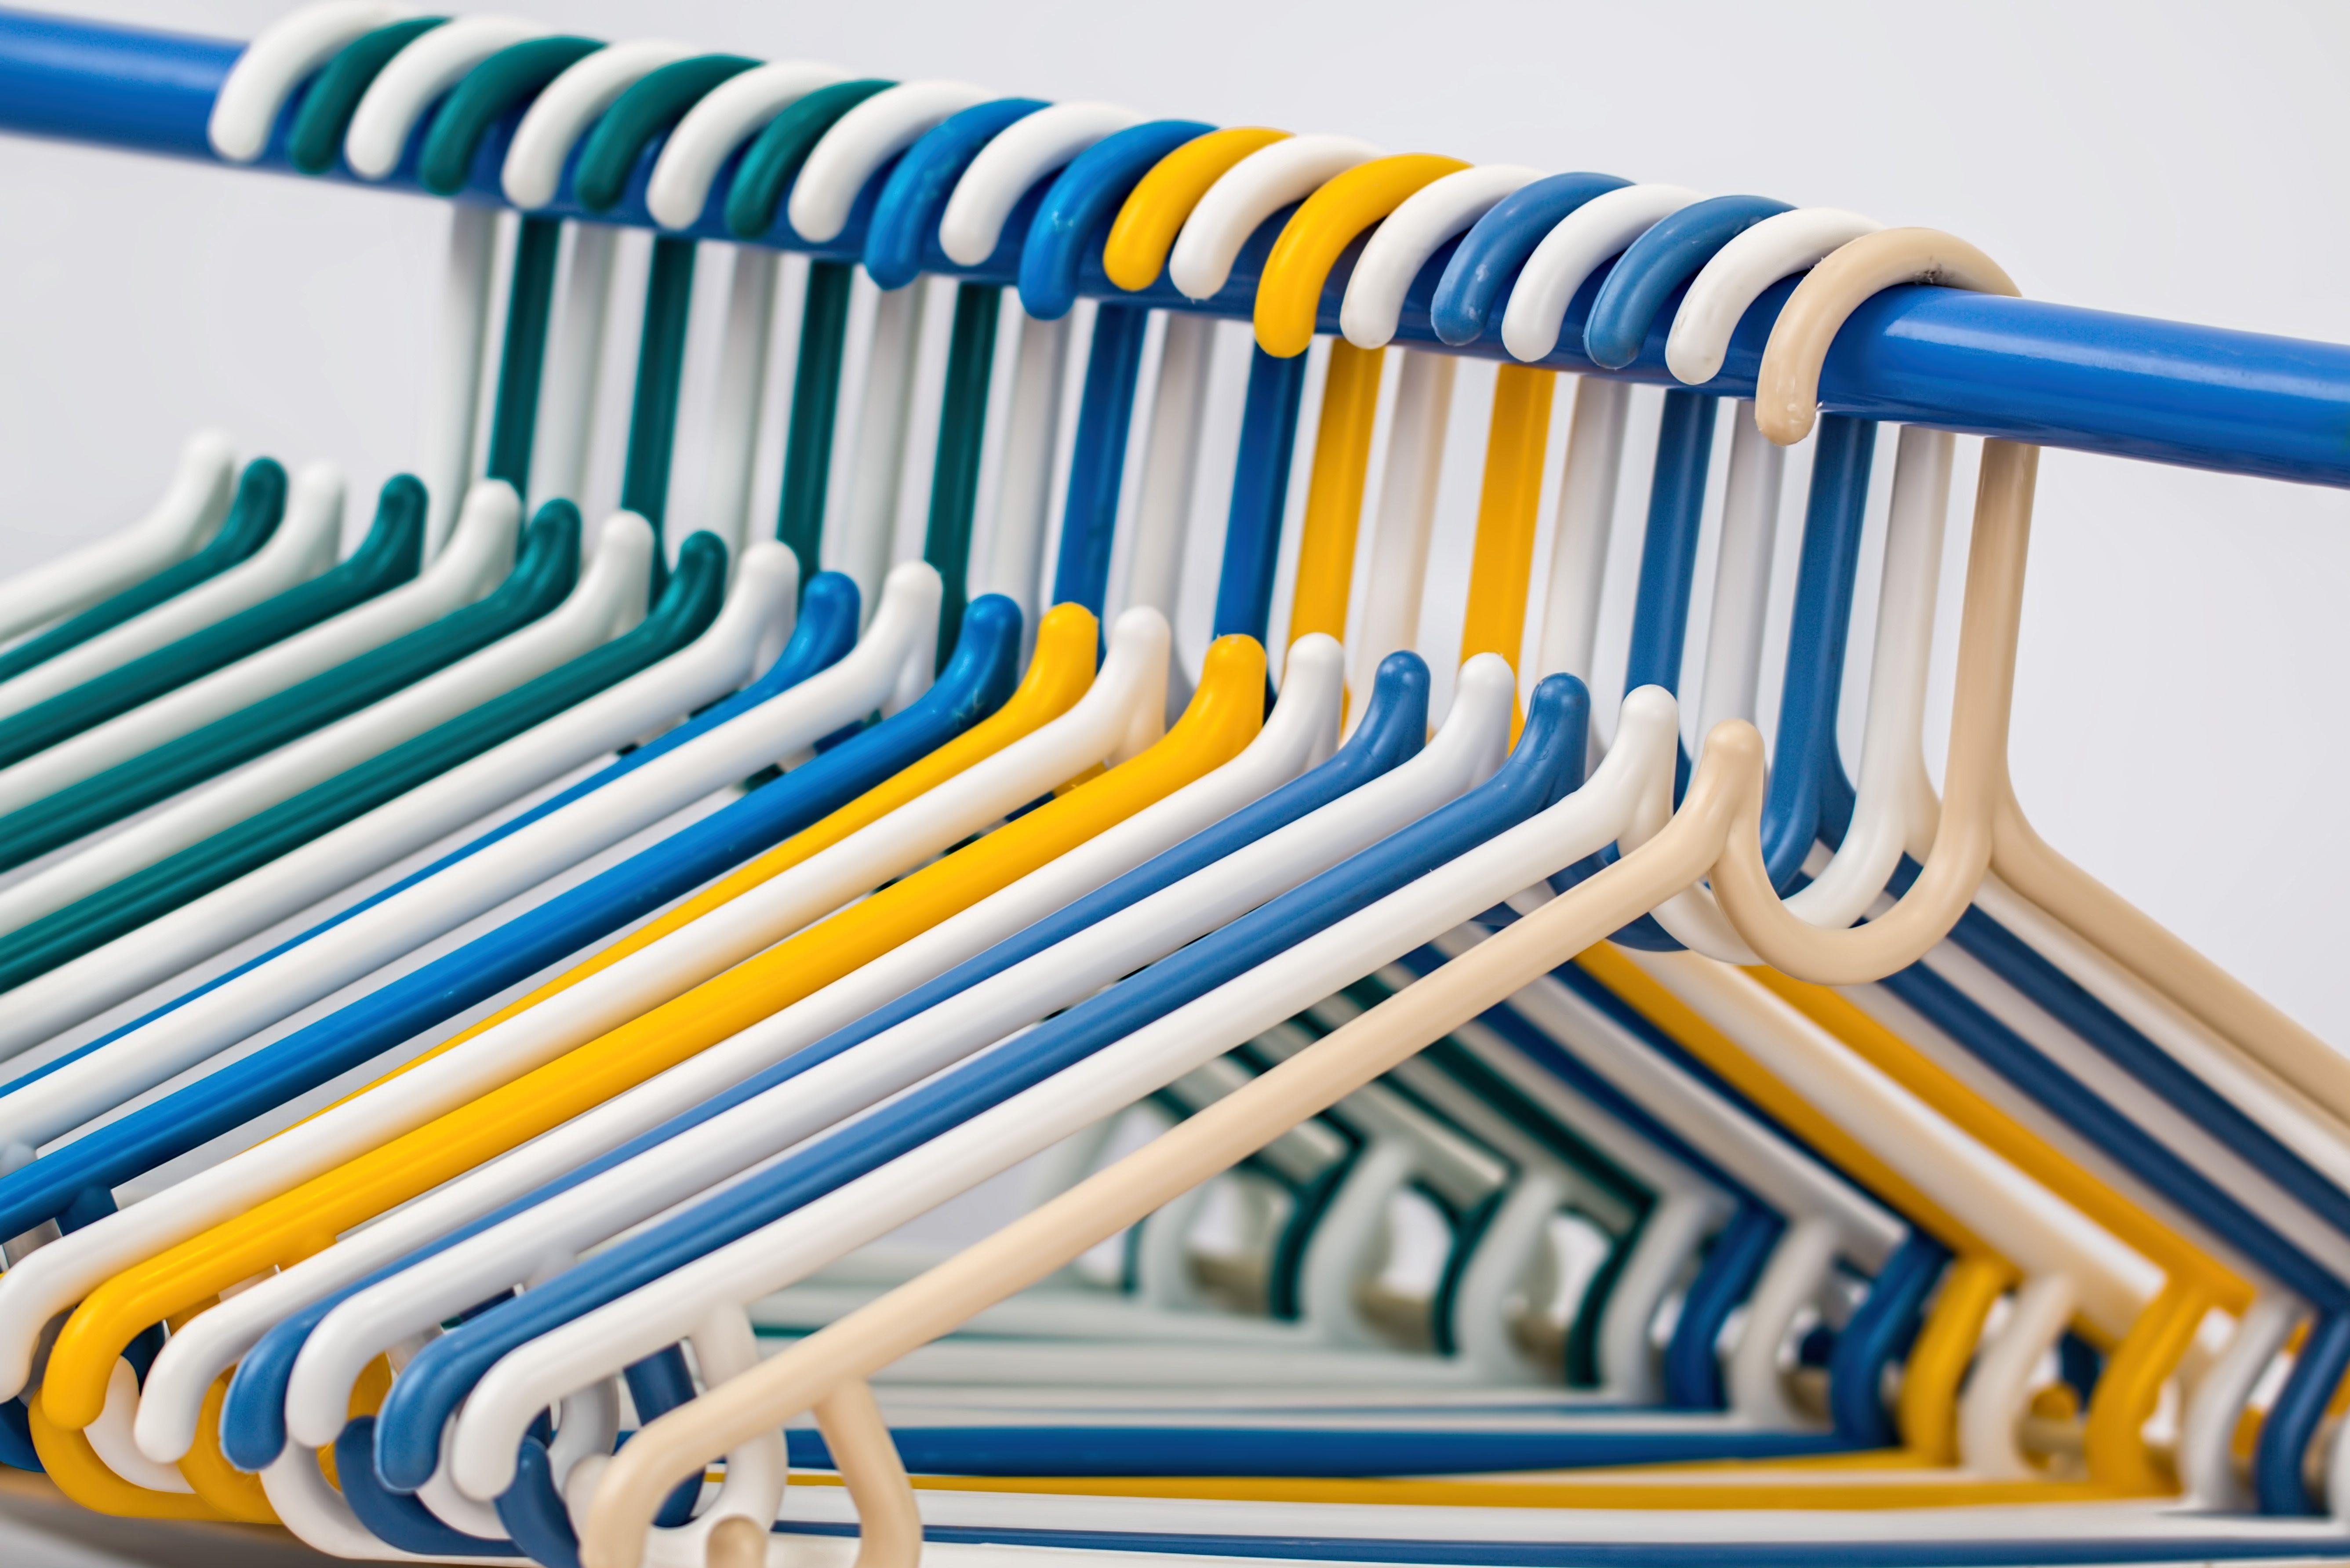 Clothes hangers irhw6l